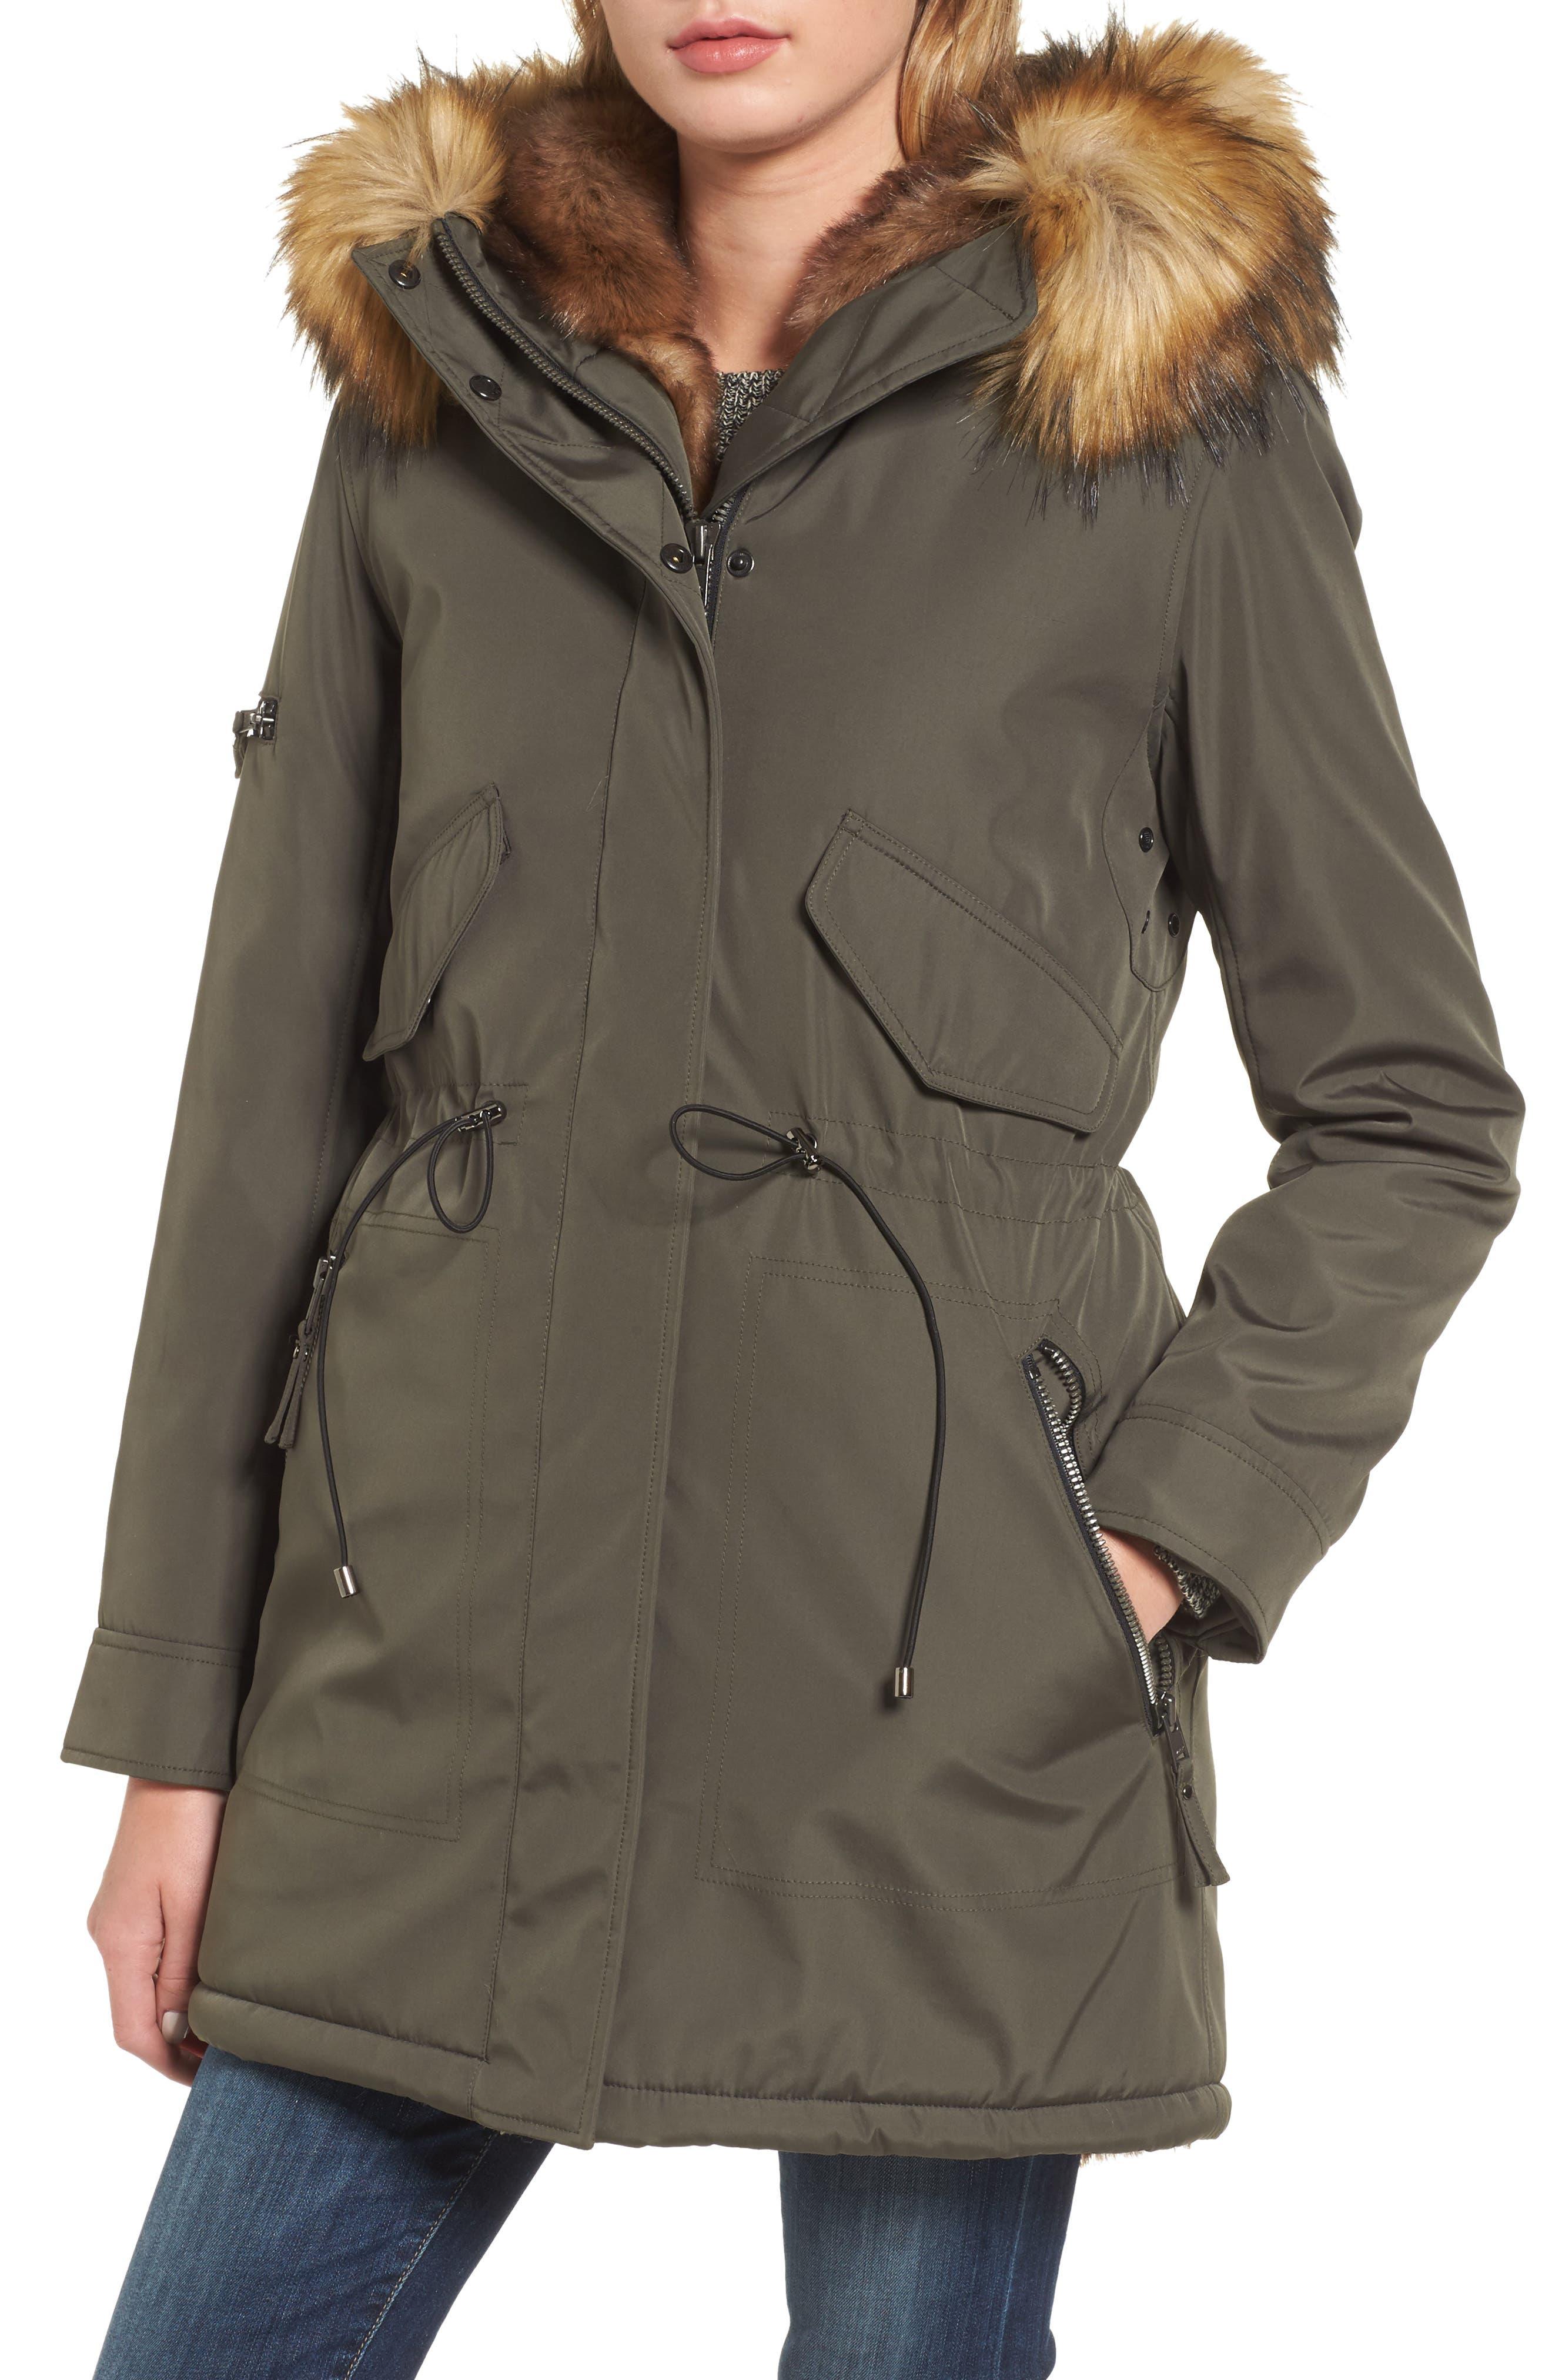 Alternate Image 1 Selected - S13 Faux Fur Hooded Anorak